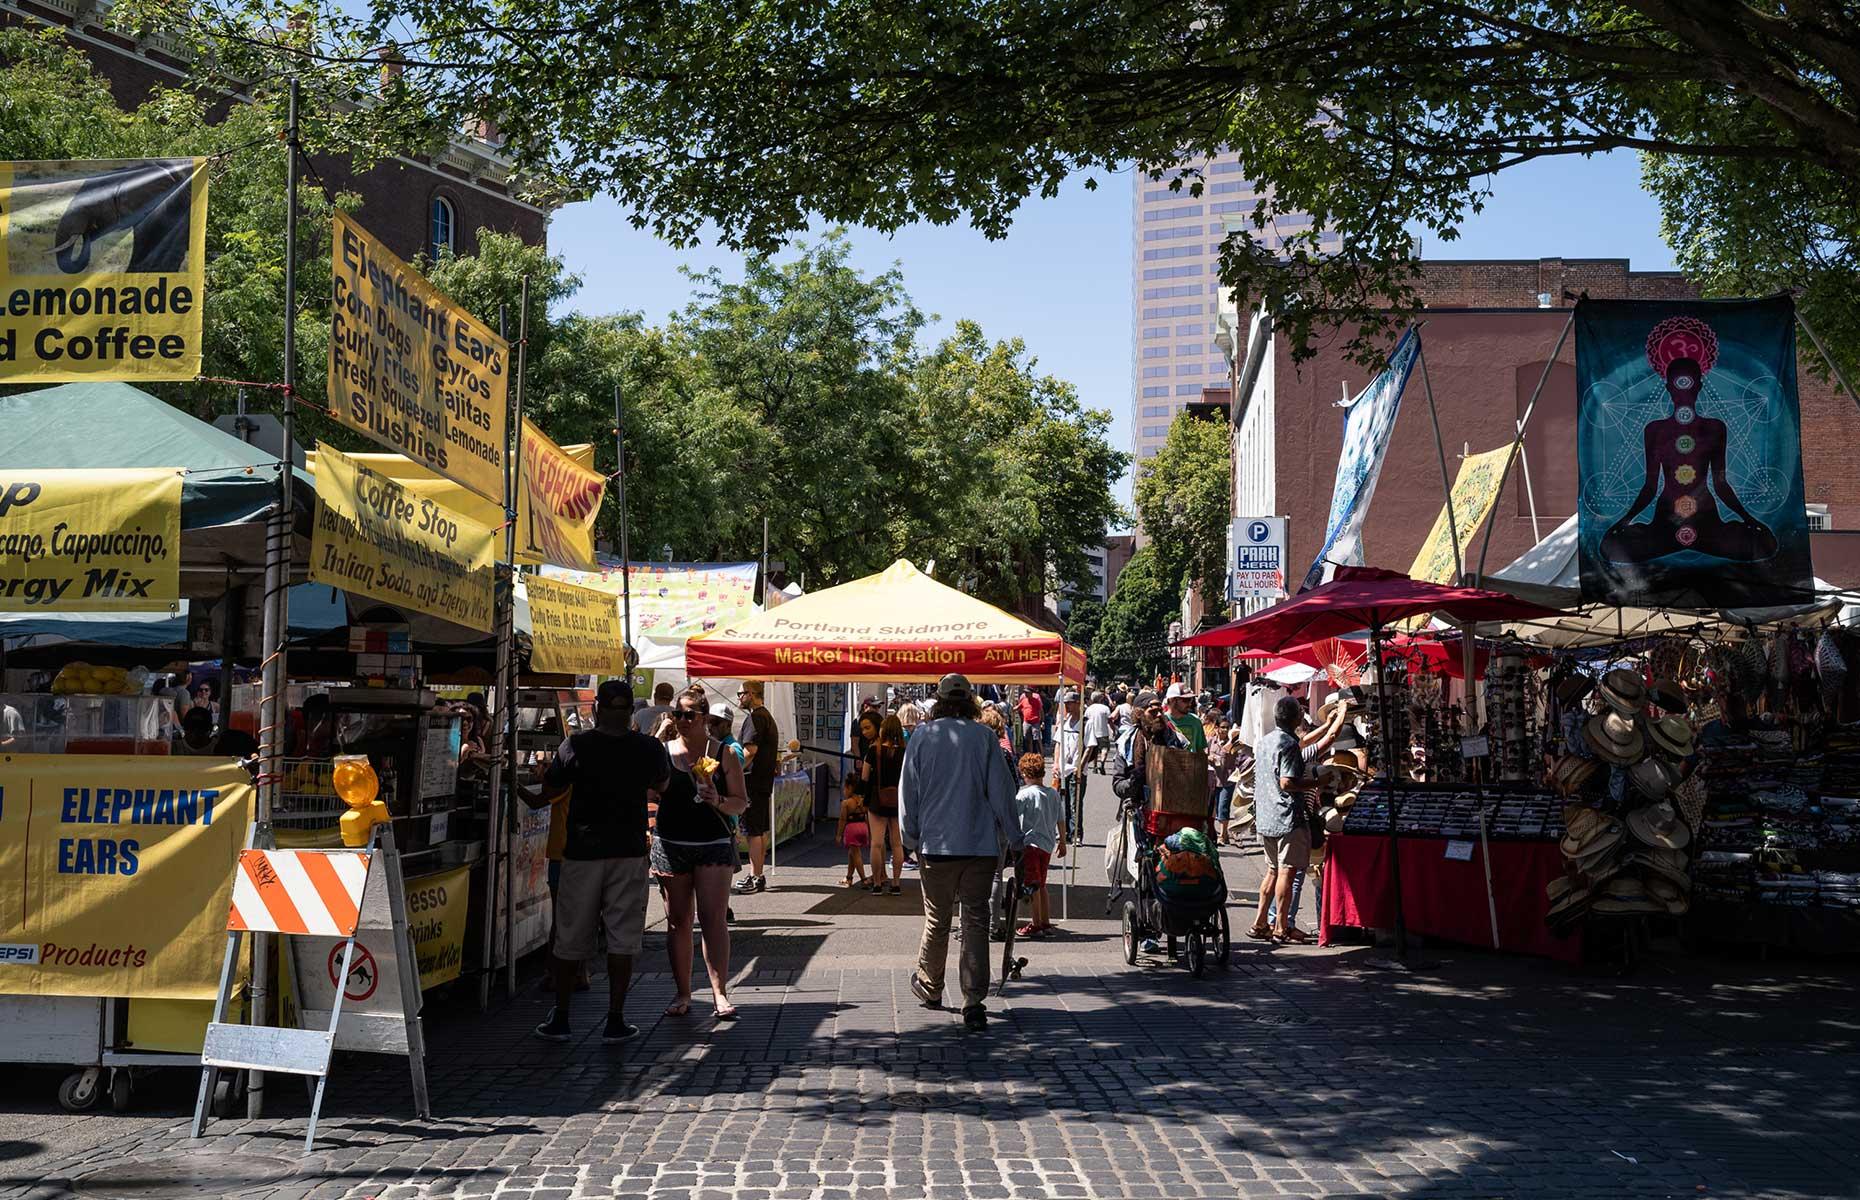 Saturday market at the waterfront, Portland, Oregon (Image: Justin Katigbak/Travel Portland)